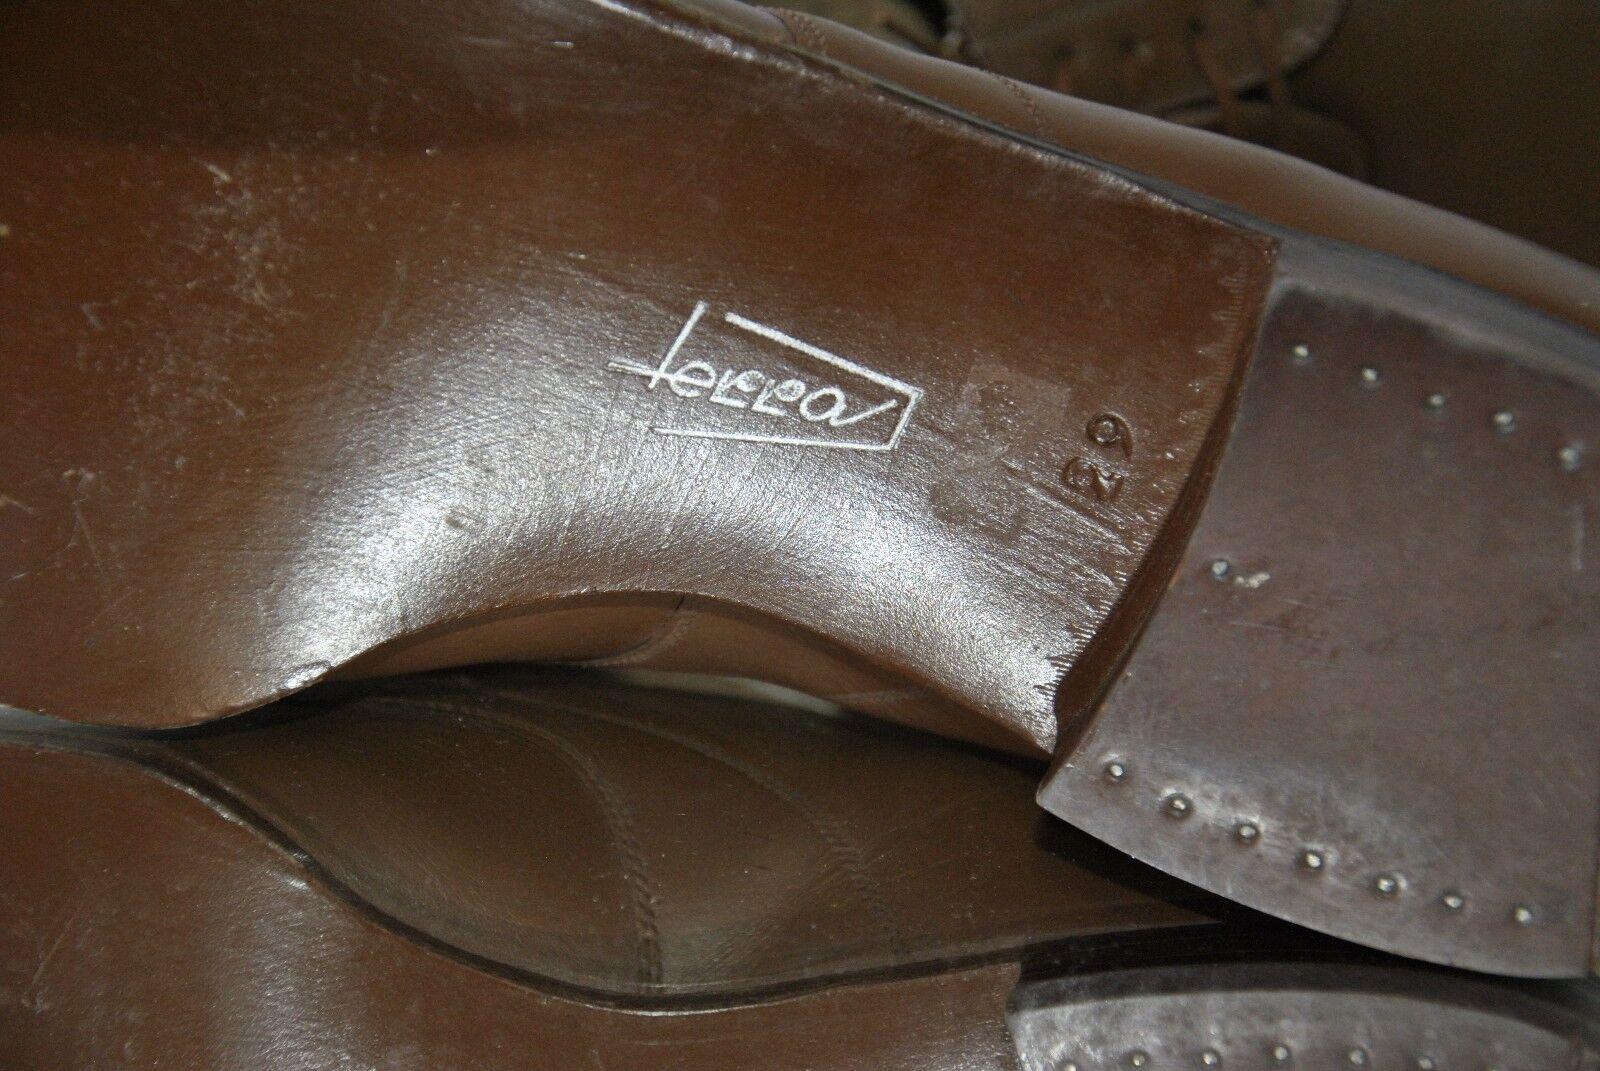 Terra TRUE Herrenschuhe 50s Leder Schuh TRUE Terra VINTAGE Oxfords Budapester W.Germany 600b0e